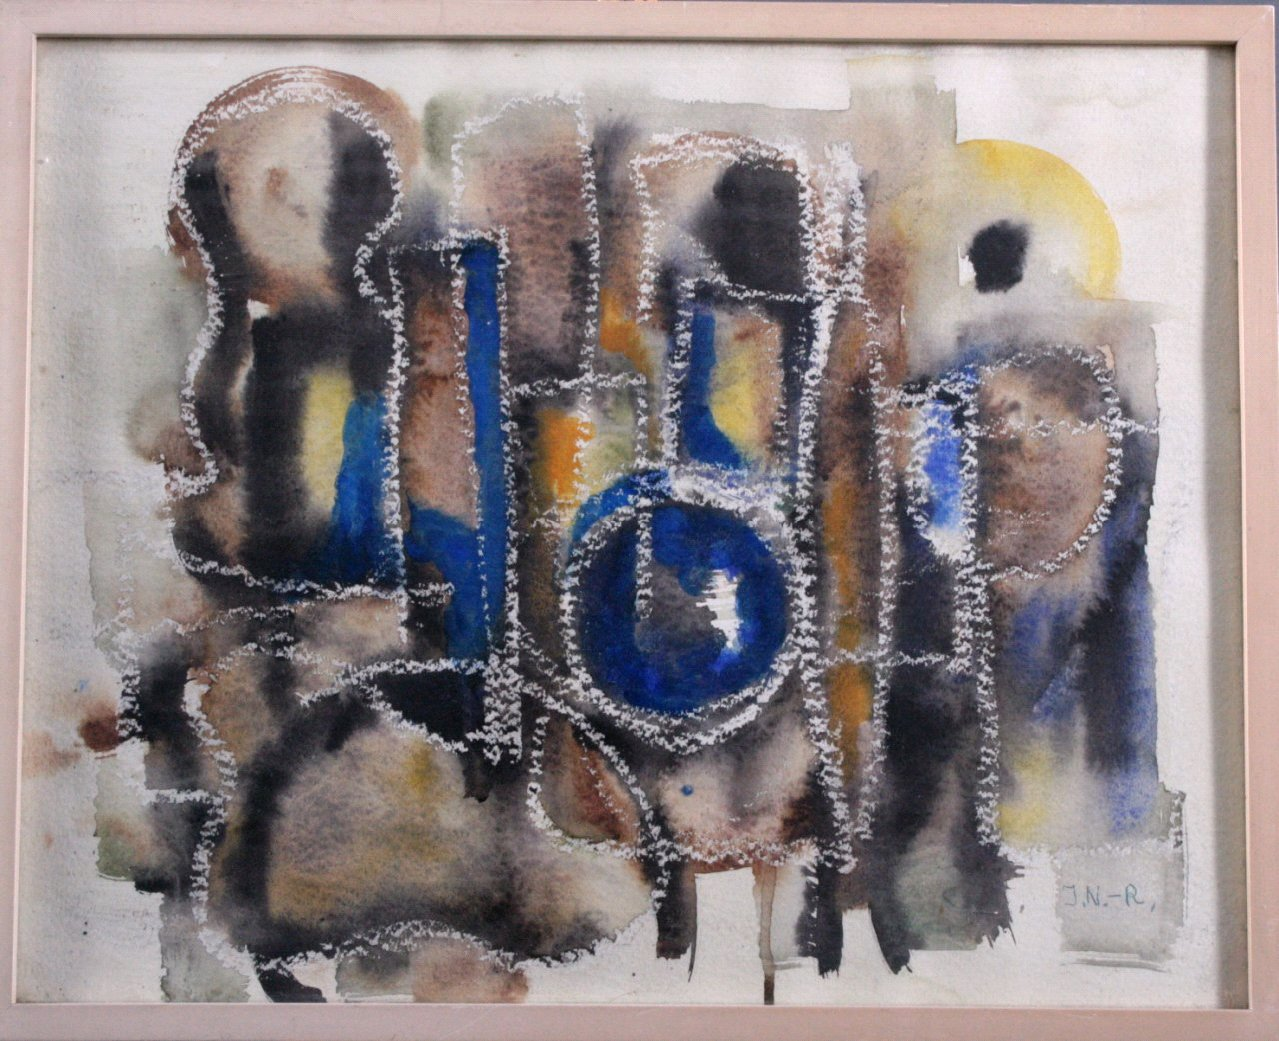 Ilse Nickol-Ruppel, Abstrakte Komposition